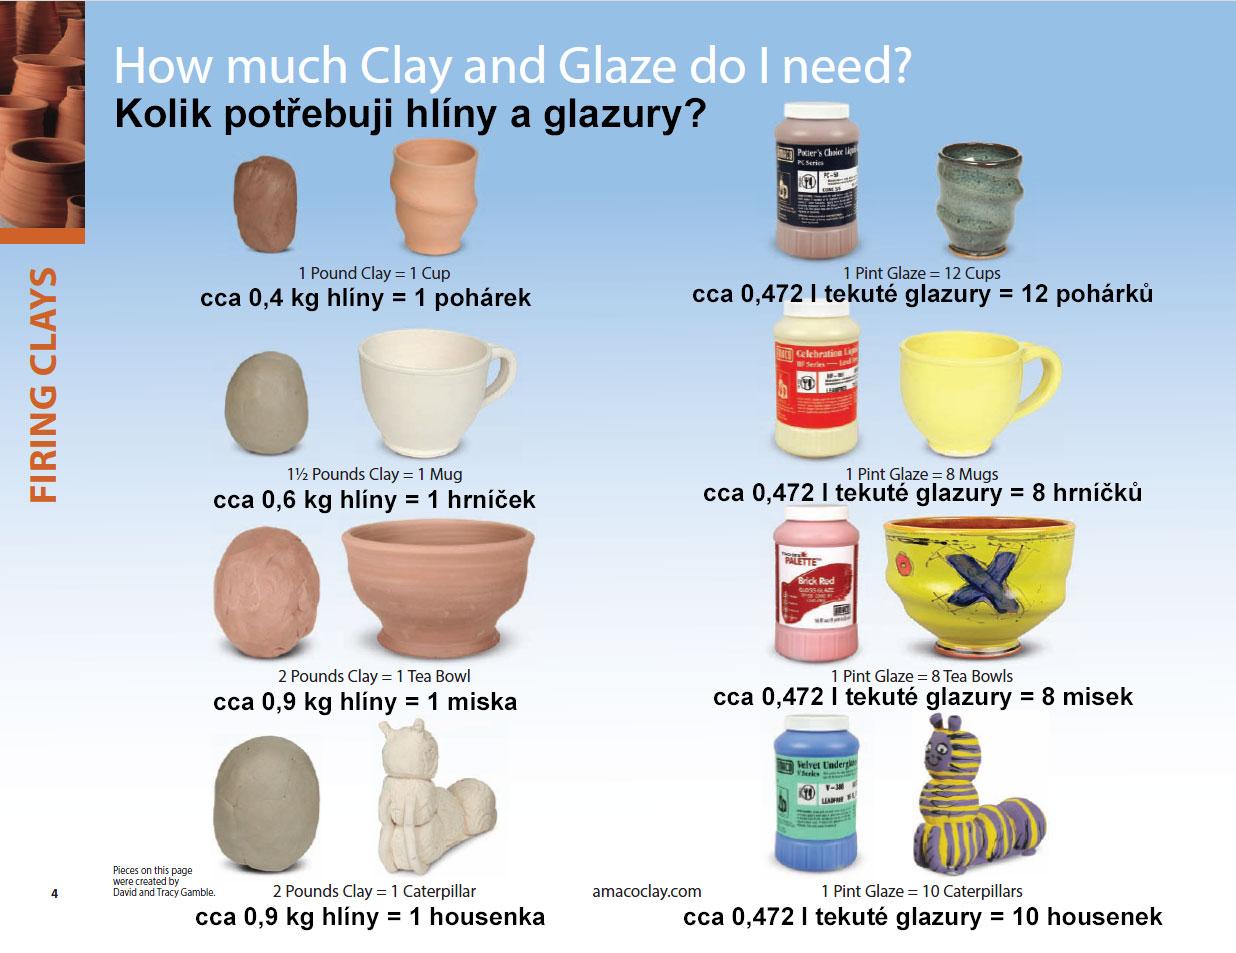 Kolik potřebuji?